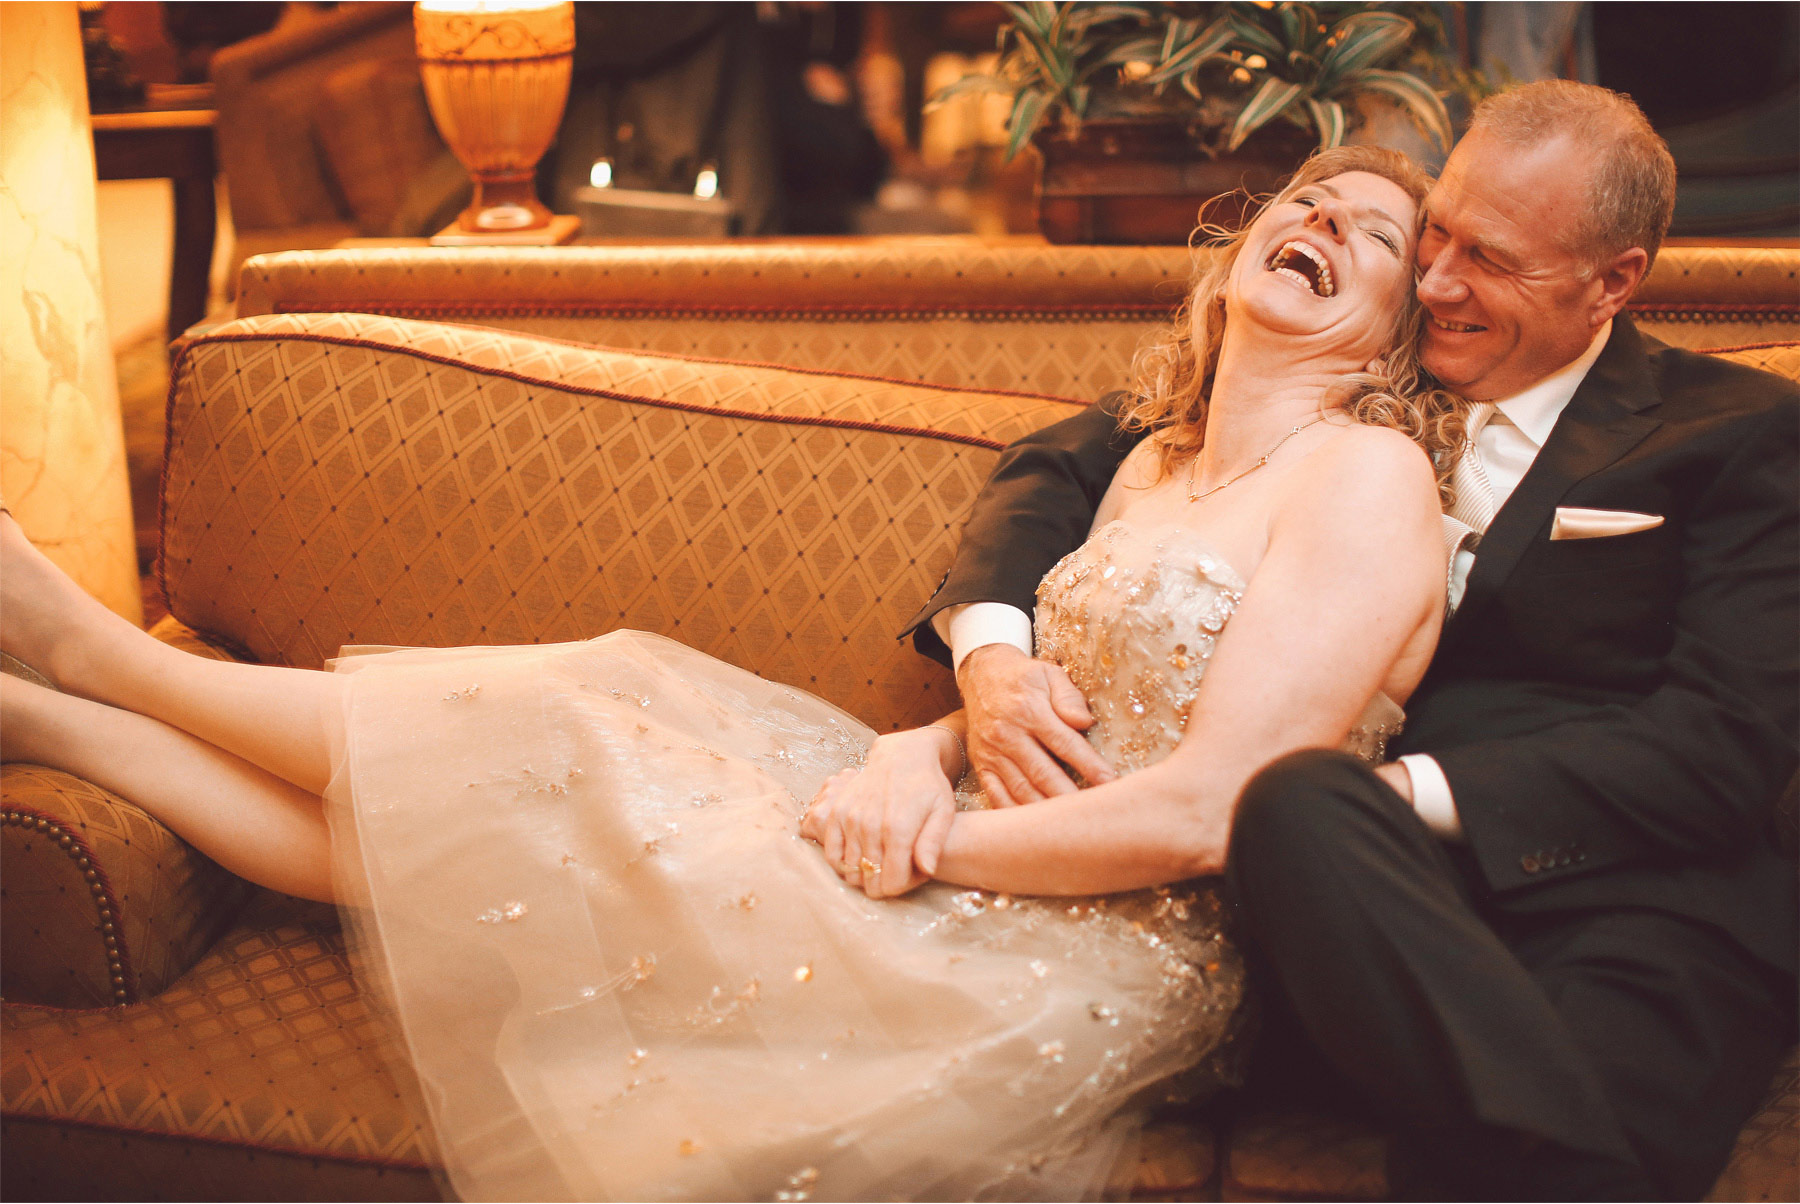 05-Saint-Paul-Minnesota-Wedding-Photographer-by-Andrew-Vick-Photography-Winter-Landmark-Center-First-Meeting-Look-Bride-Groom-Embrace-Laughter-Vintage-Dannette-and-Darren.jpg